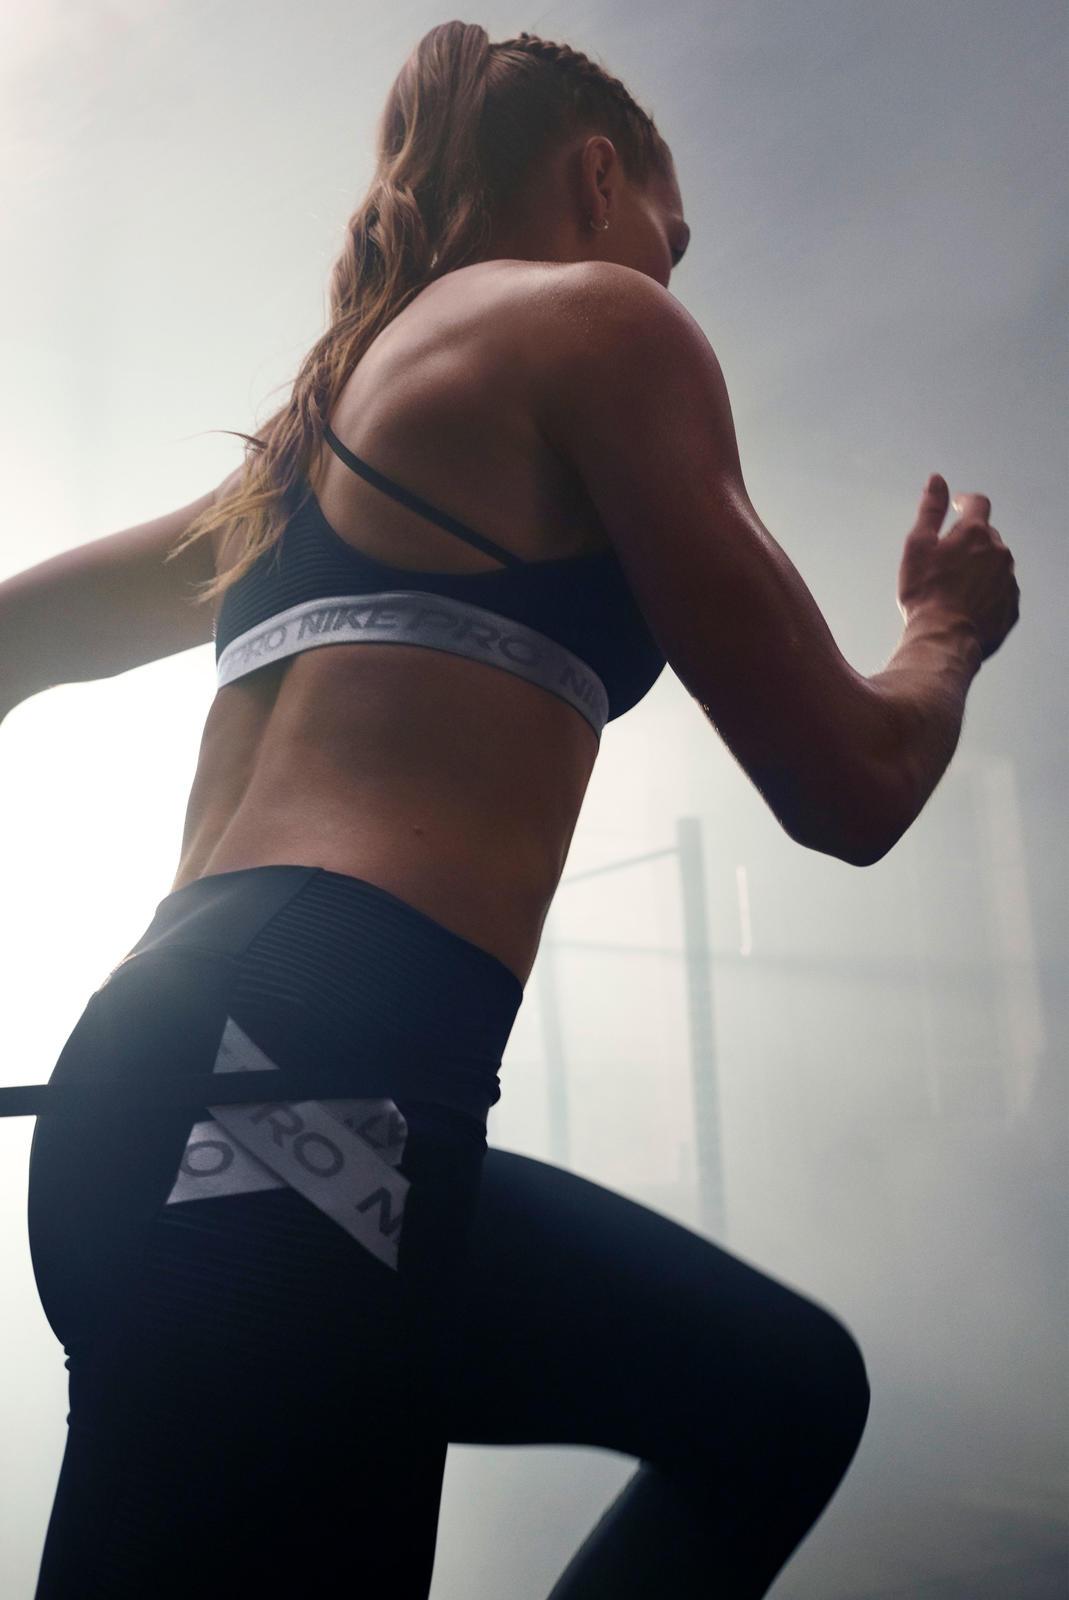 NikeNews_NikeTraining_NikeProCollection_Quigley_5_88794.jpg